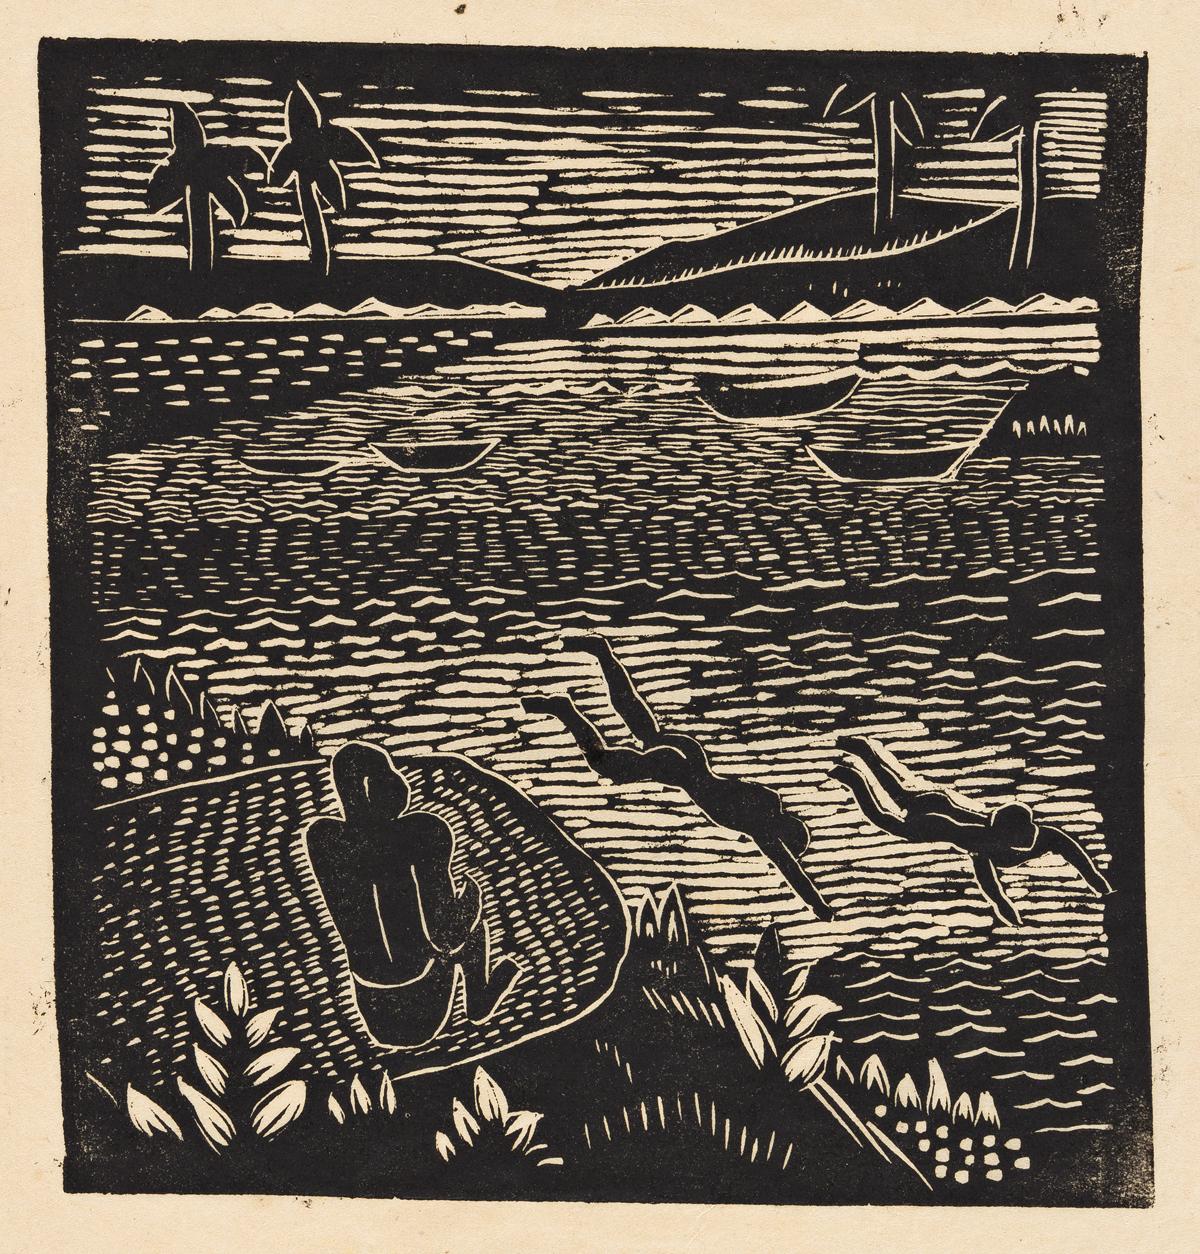 JAMES LESESNE WELLS (1902 - 1992) Group of 5 linoleum cuts.